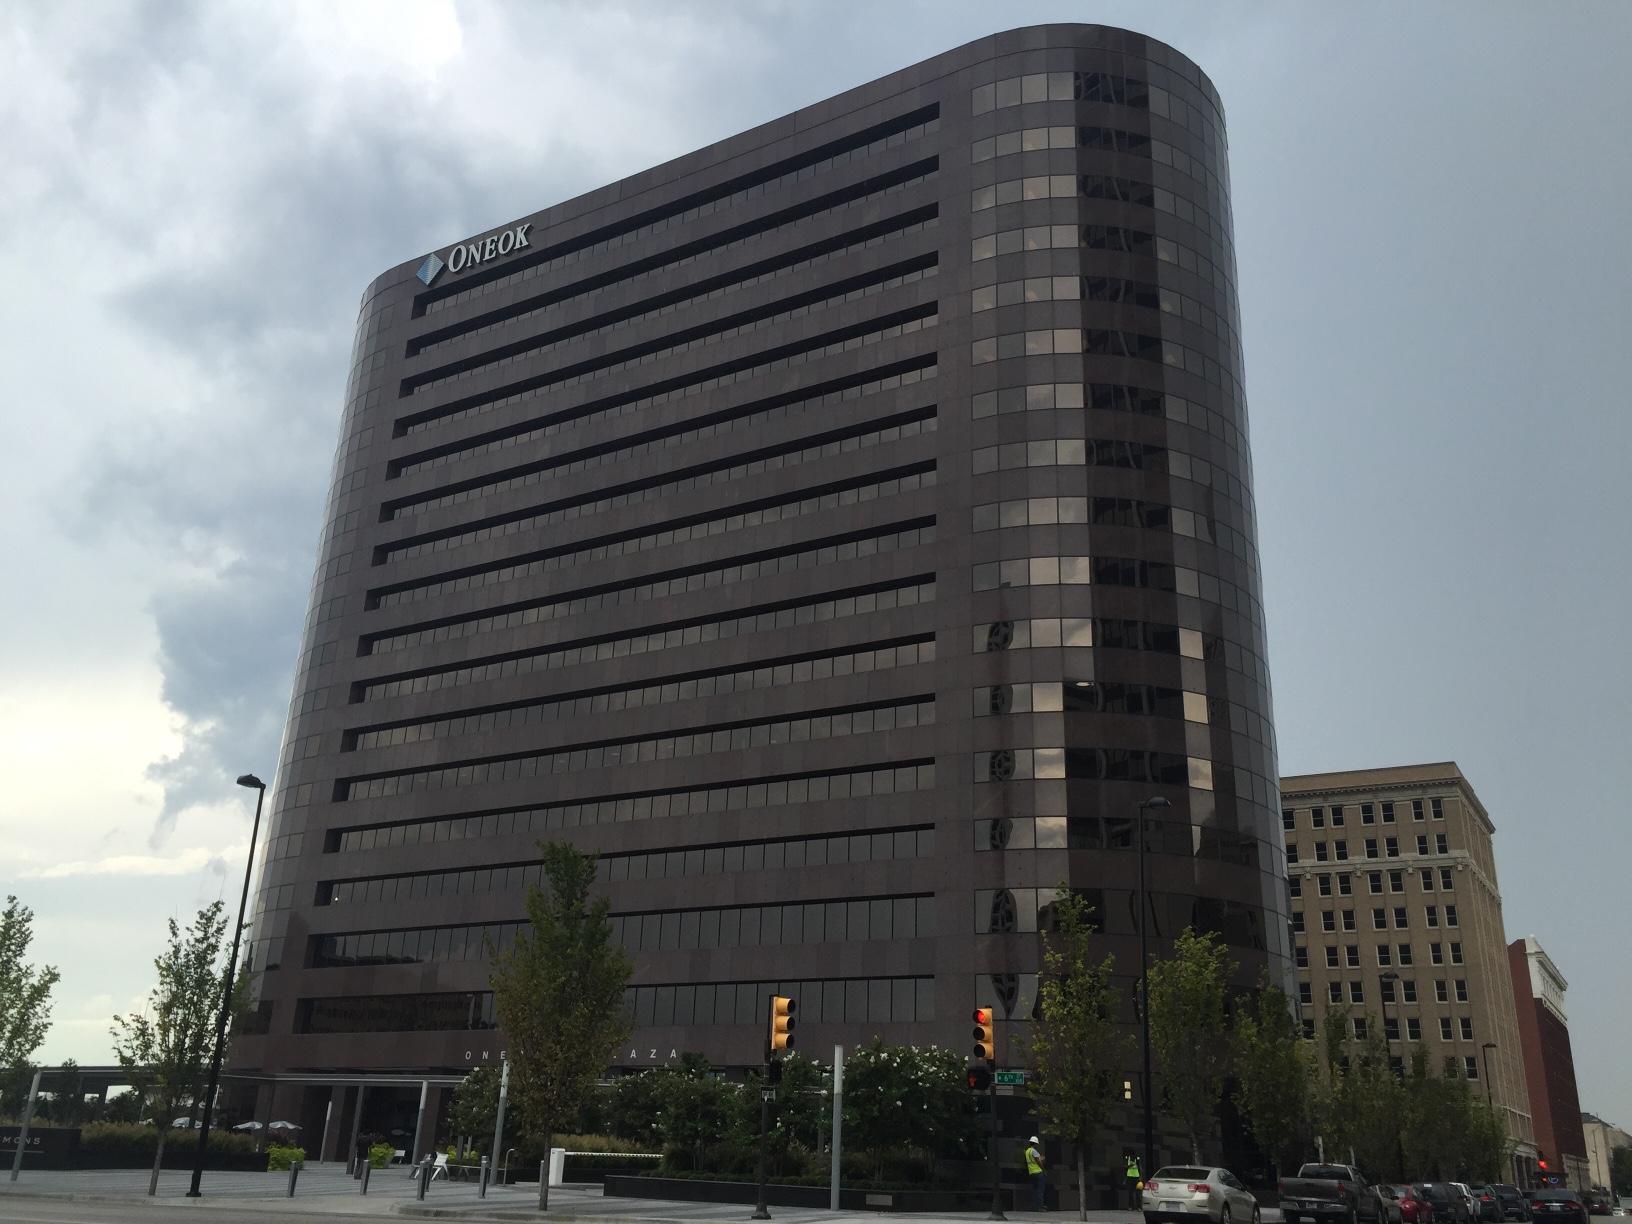 ONEOK's corporate headquarters in Tulsa, Oklahoma.